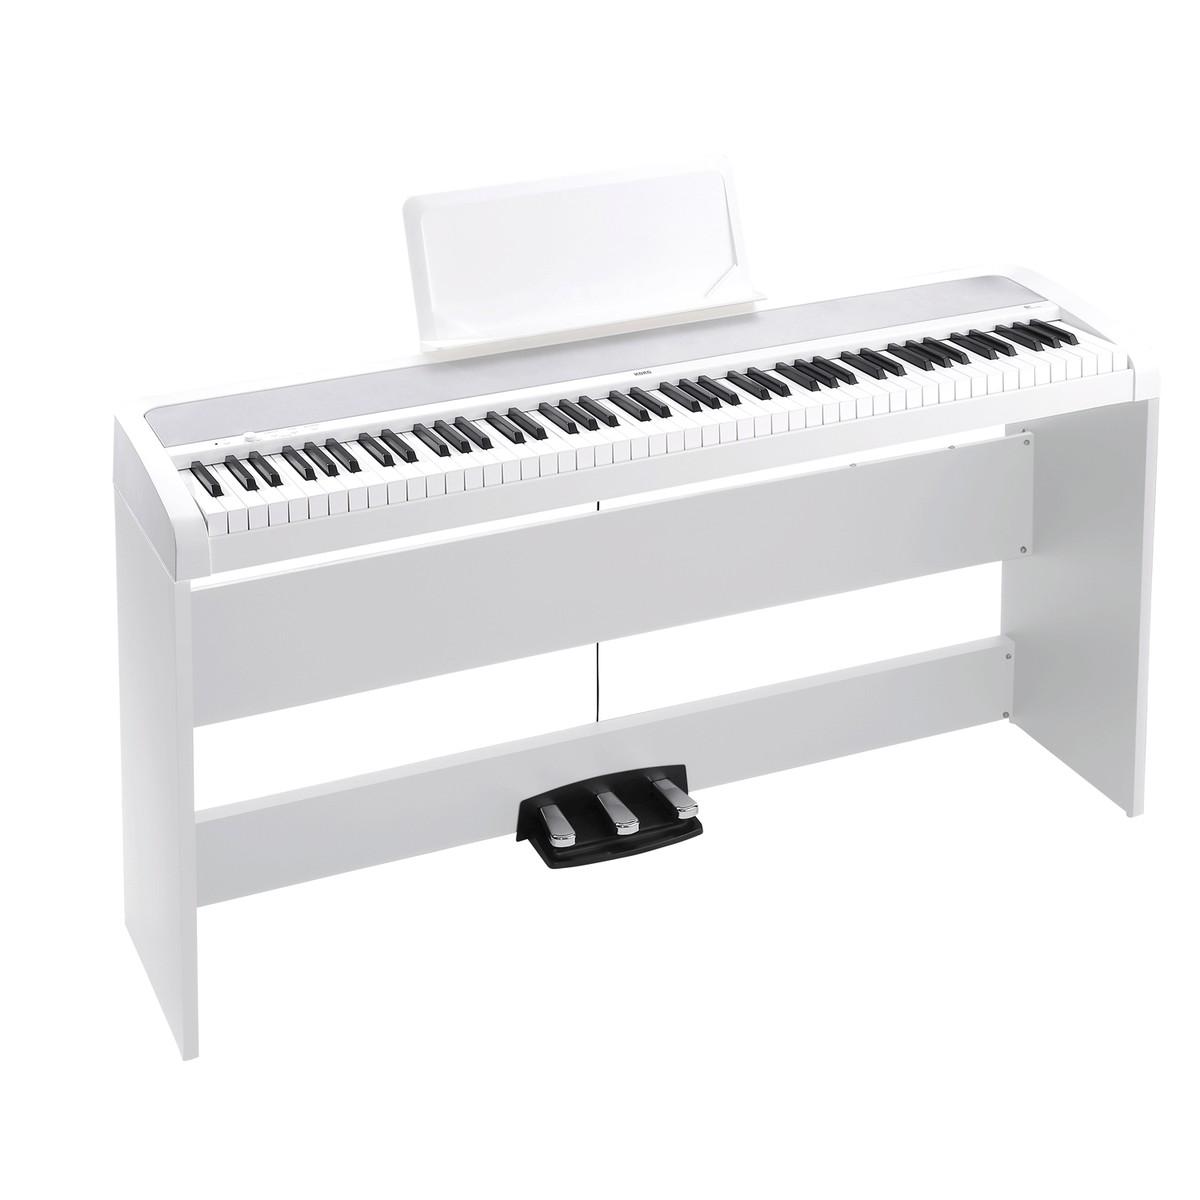 korg b1sp digital piano white at gear4music. Black Bedroom Furniture Sets. Home Design Ideas